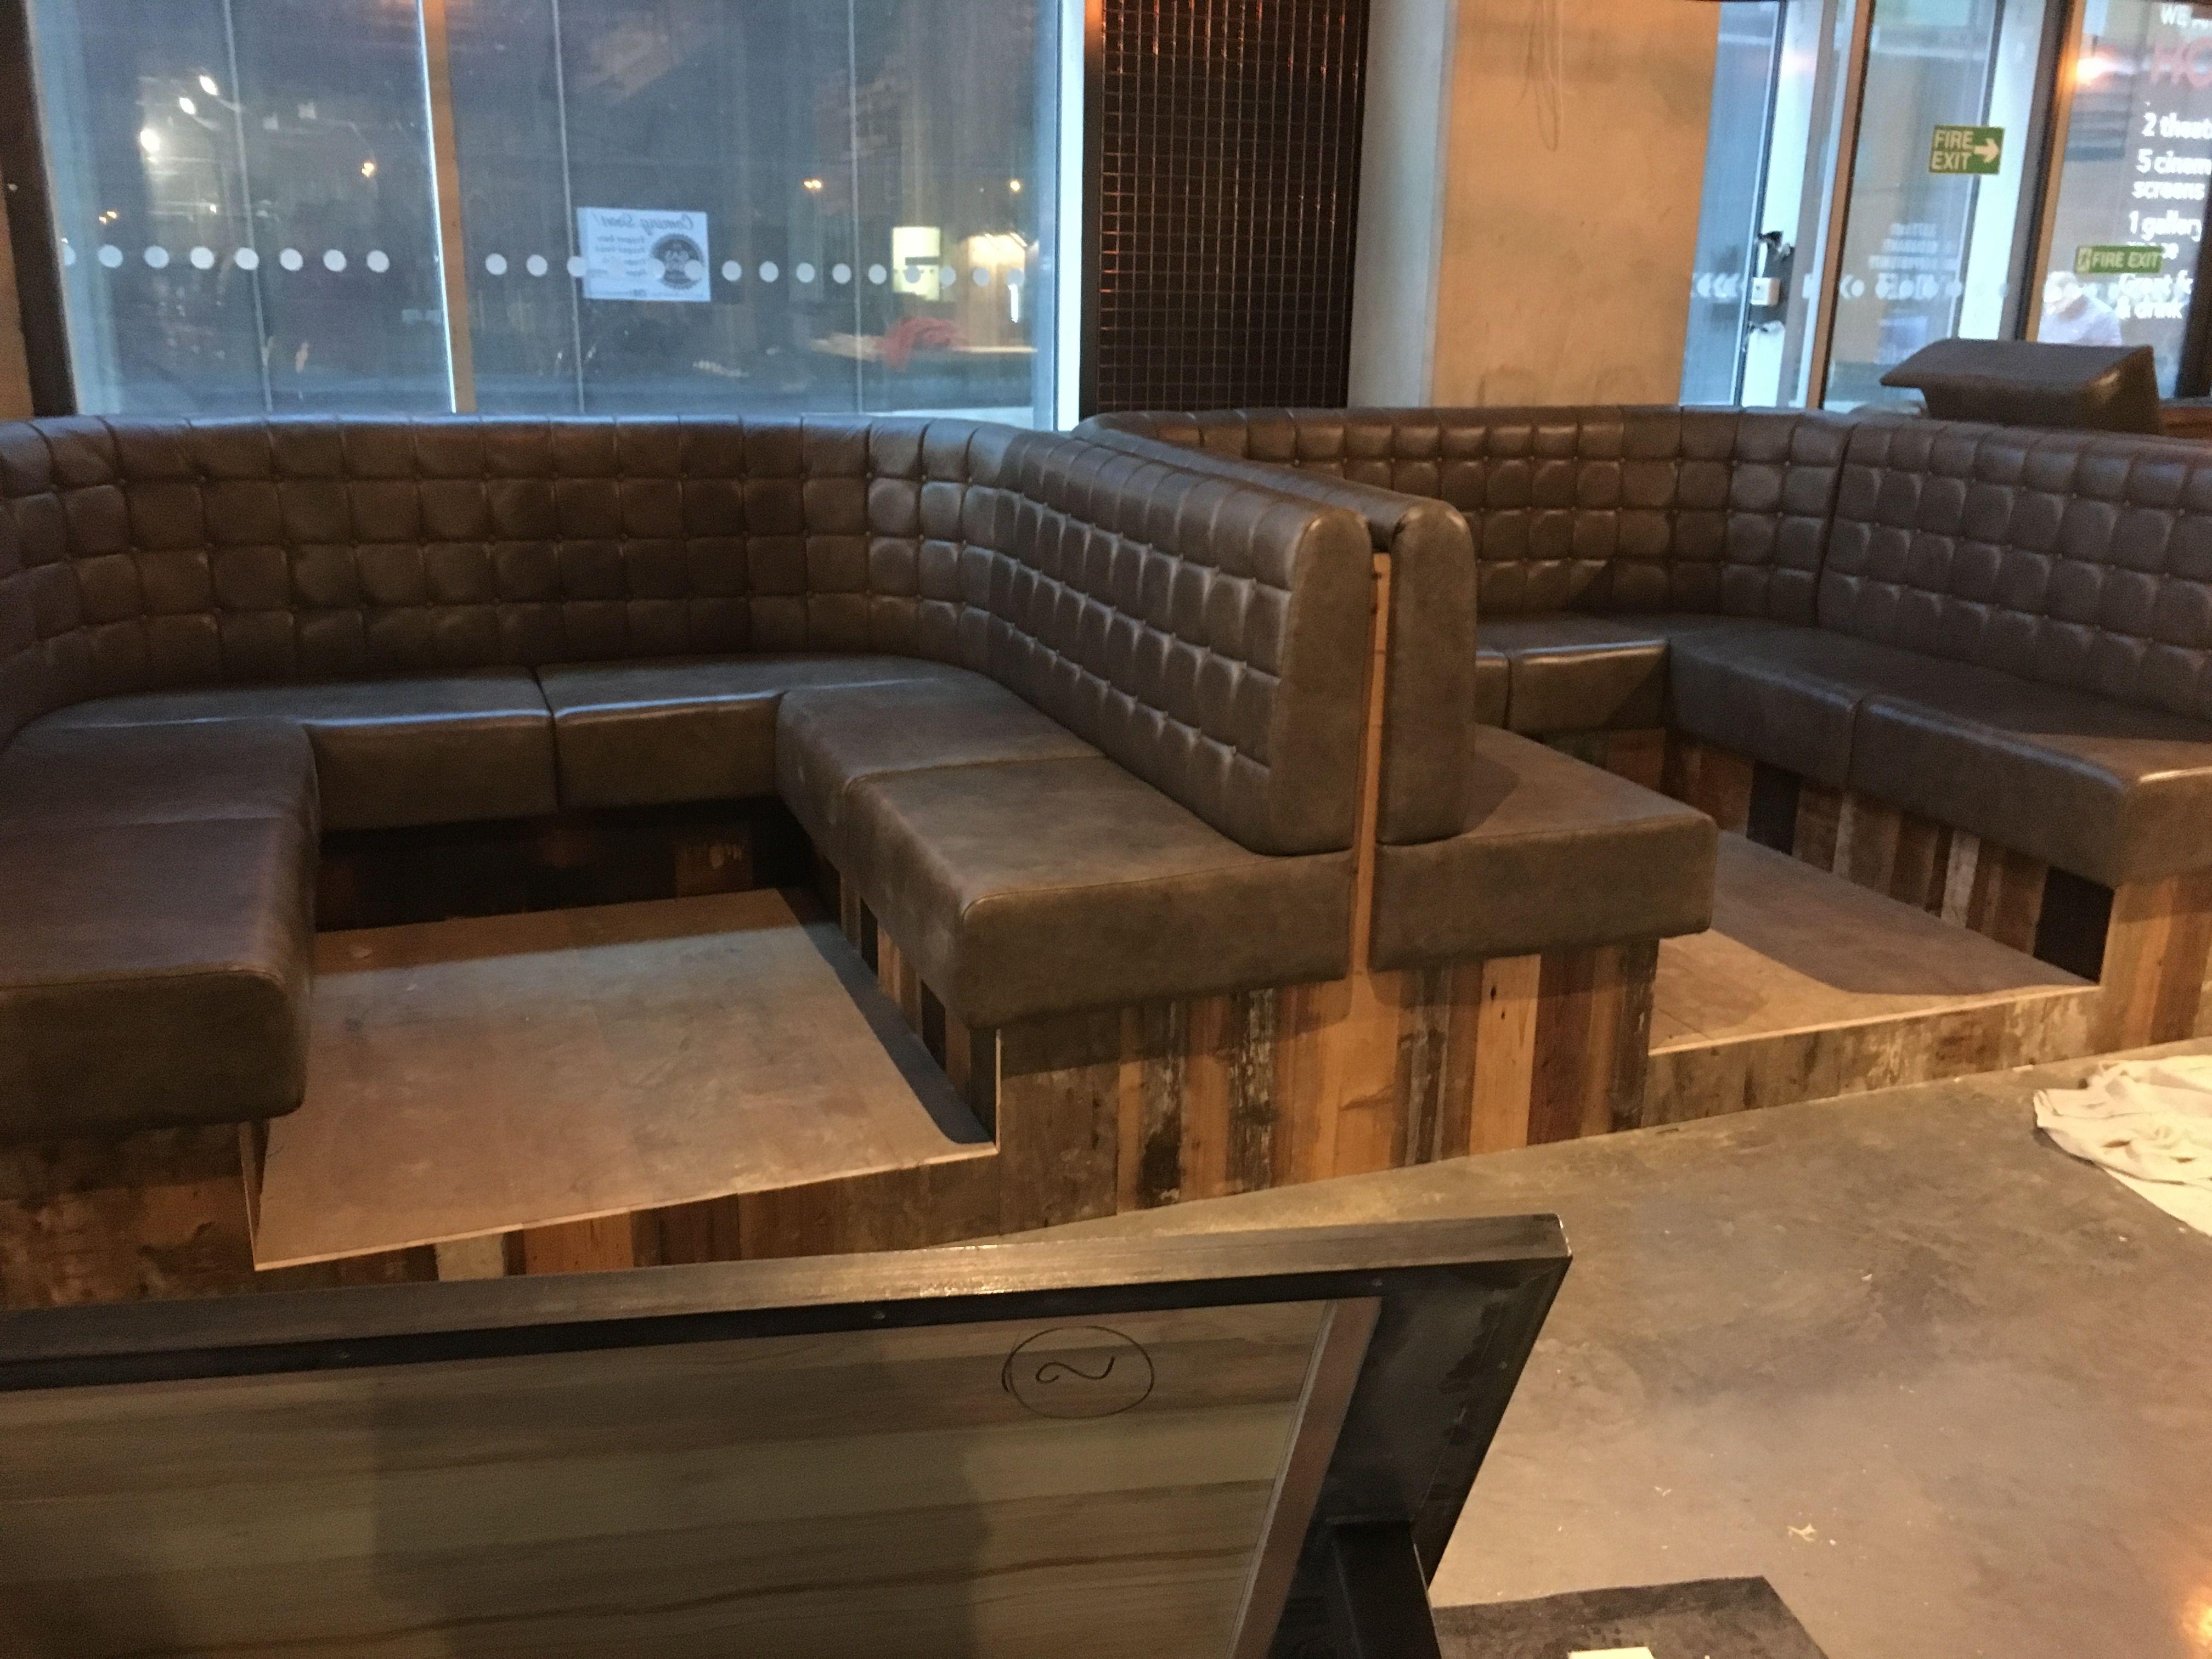 Restaurant Seating, Pergola, The Outsiders, Arbors